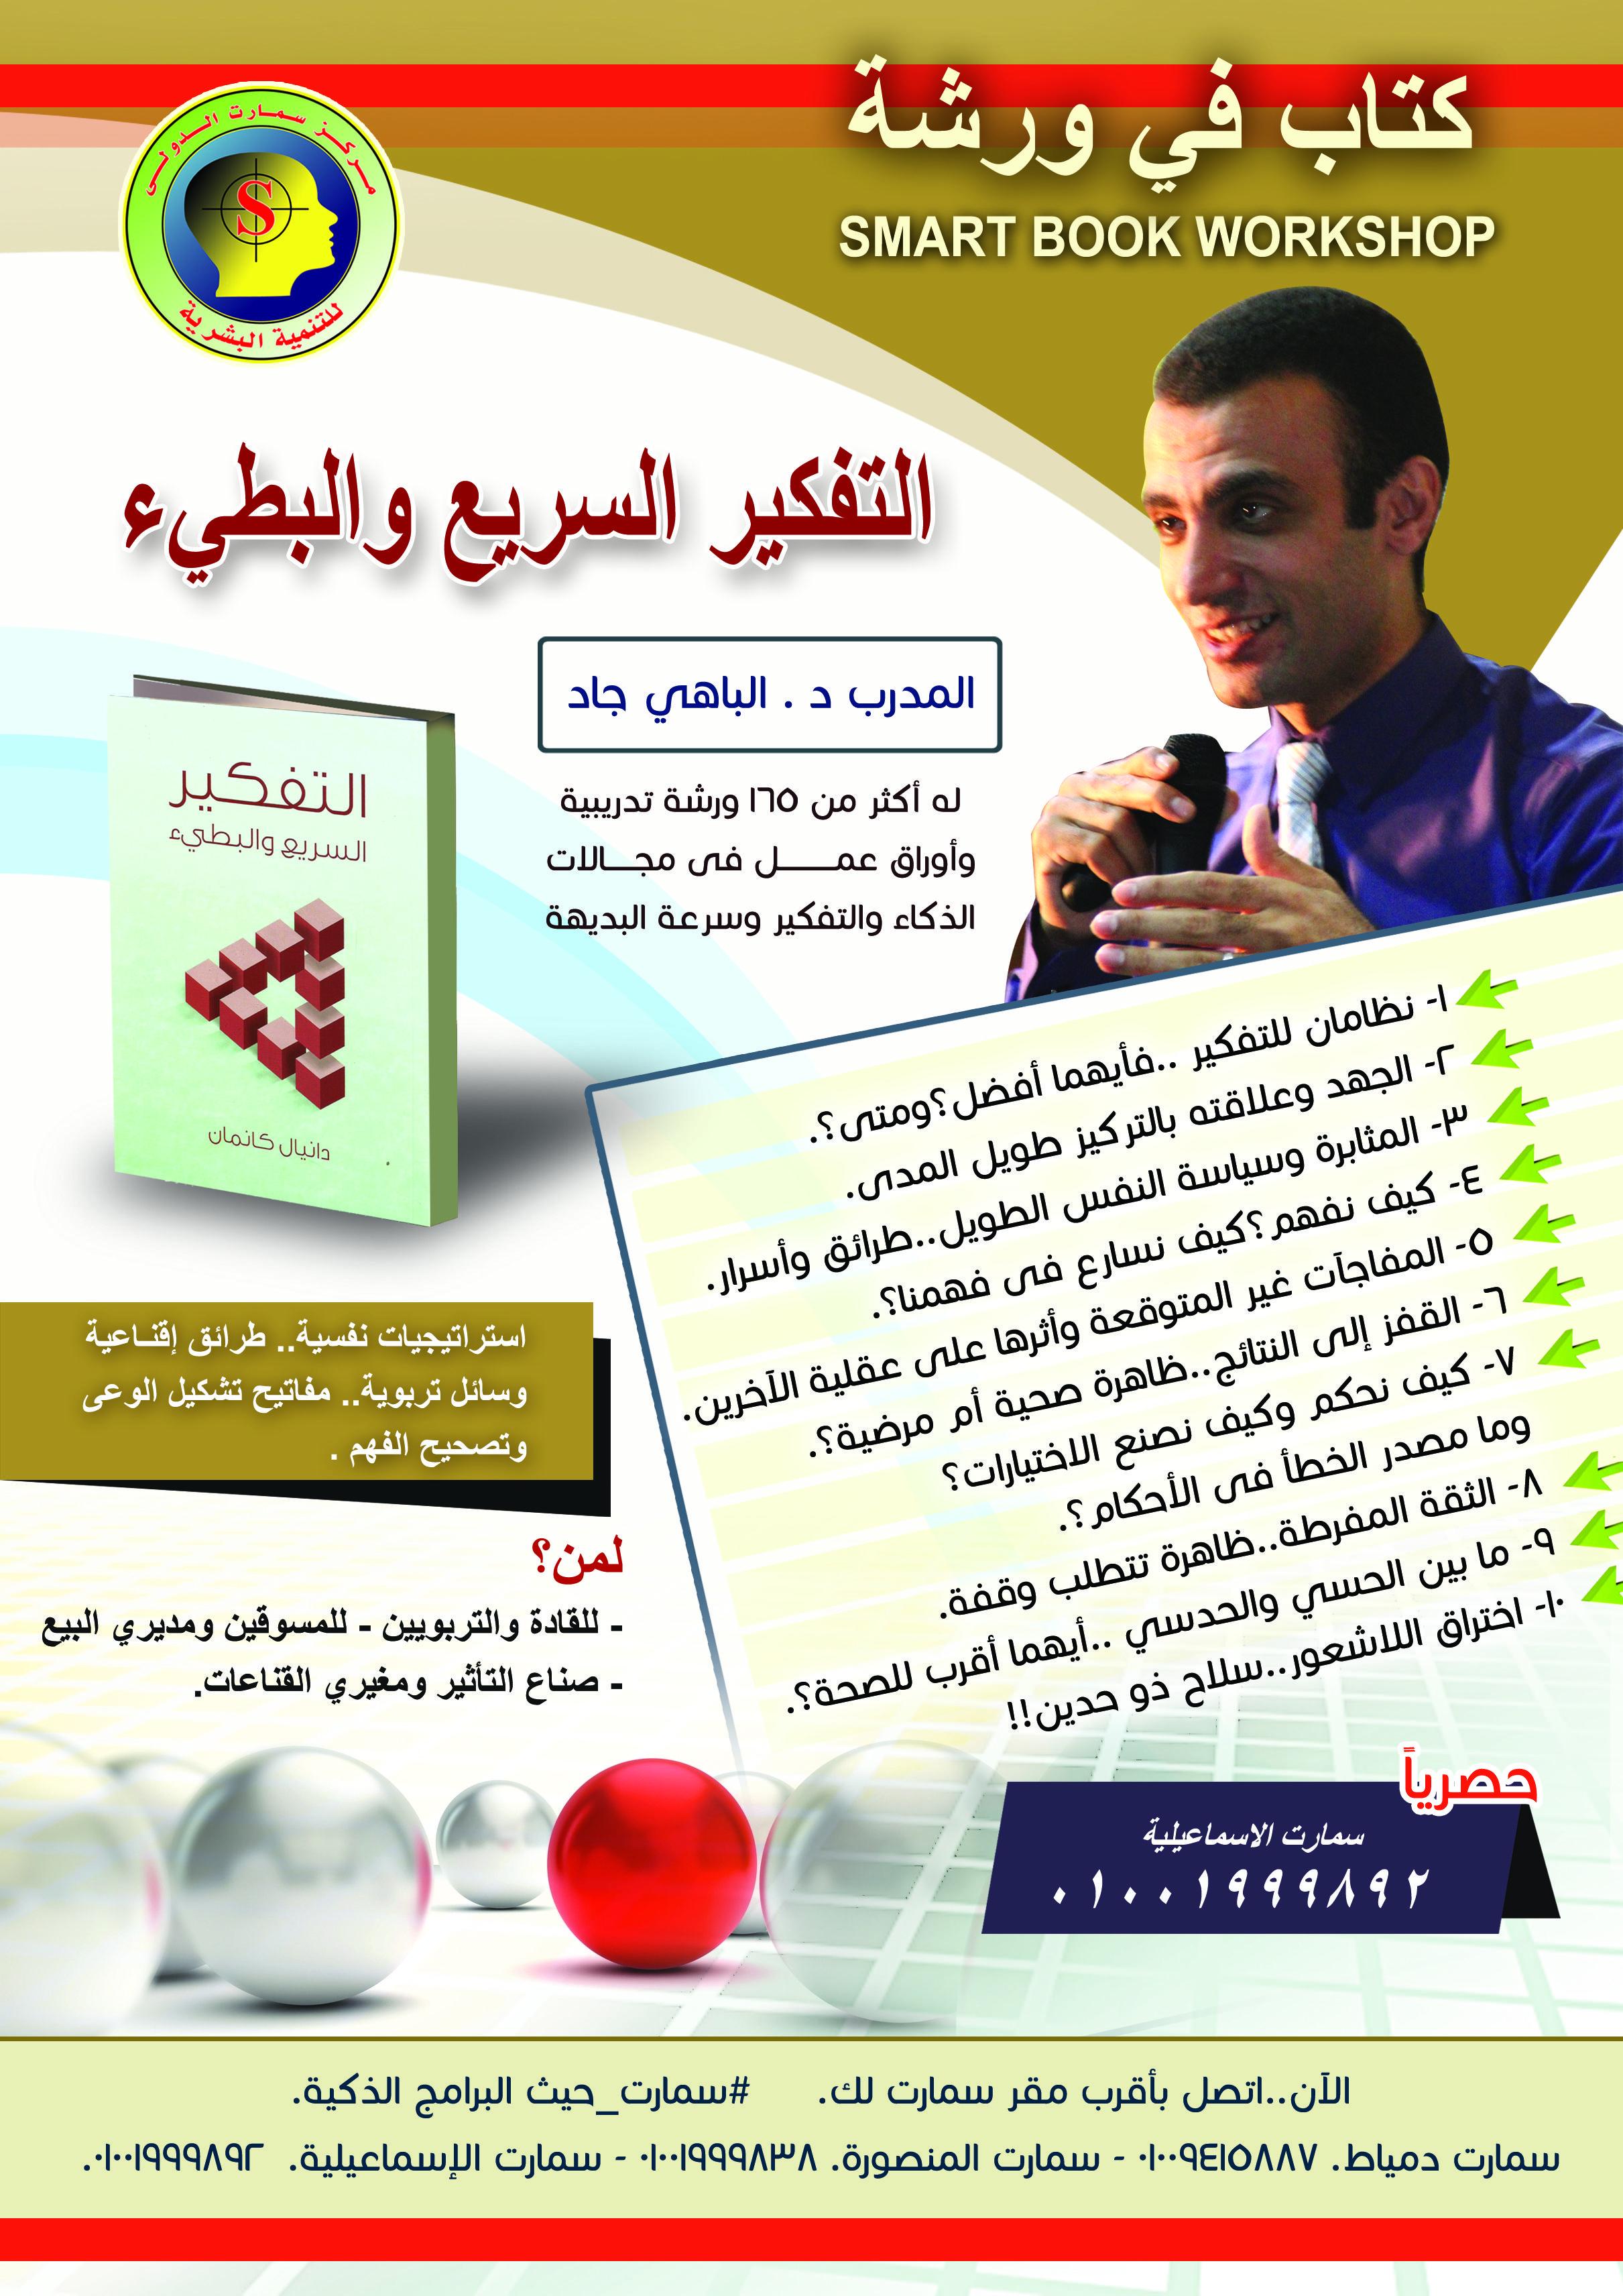 Pin By Mahmoud Bin Yousef On P S Mahmoud Bin Yousef Baseball Cards Cards Baseball